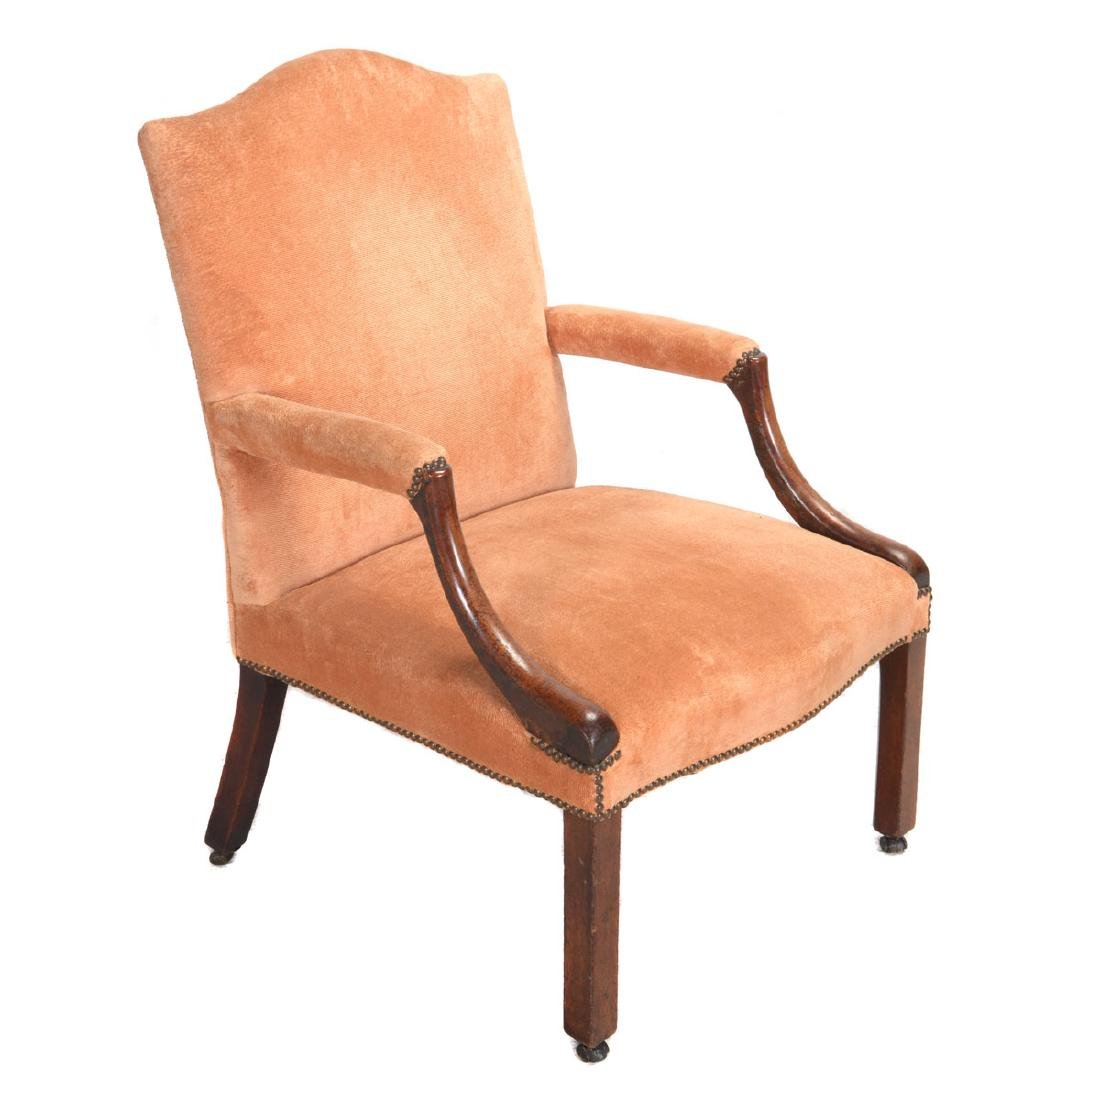 George III Mahogany Upholstered Open Armchair